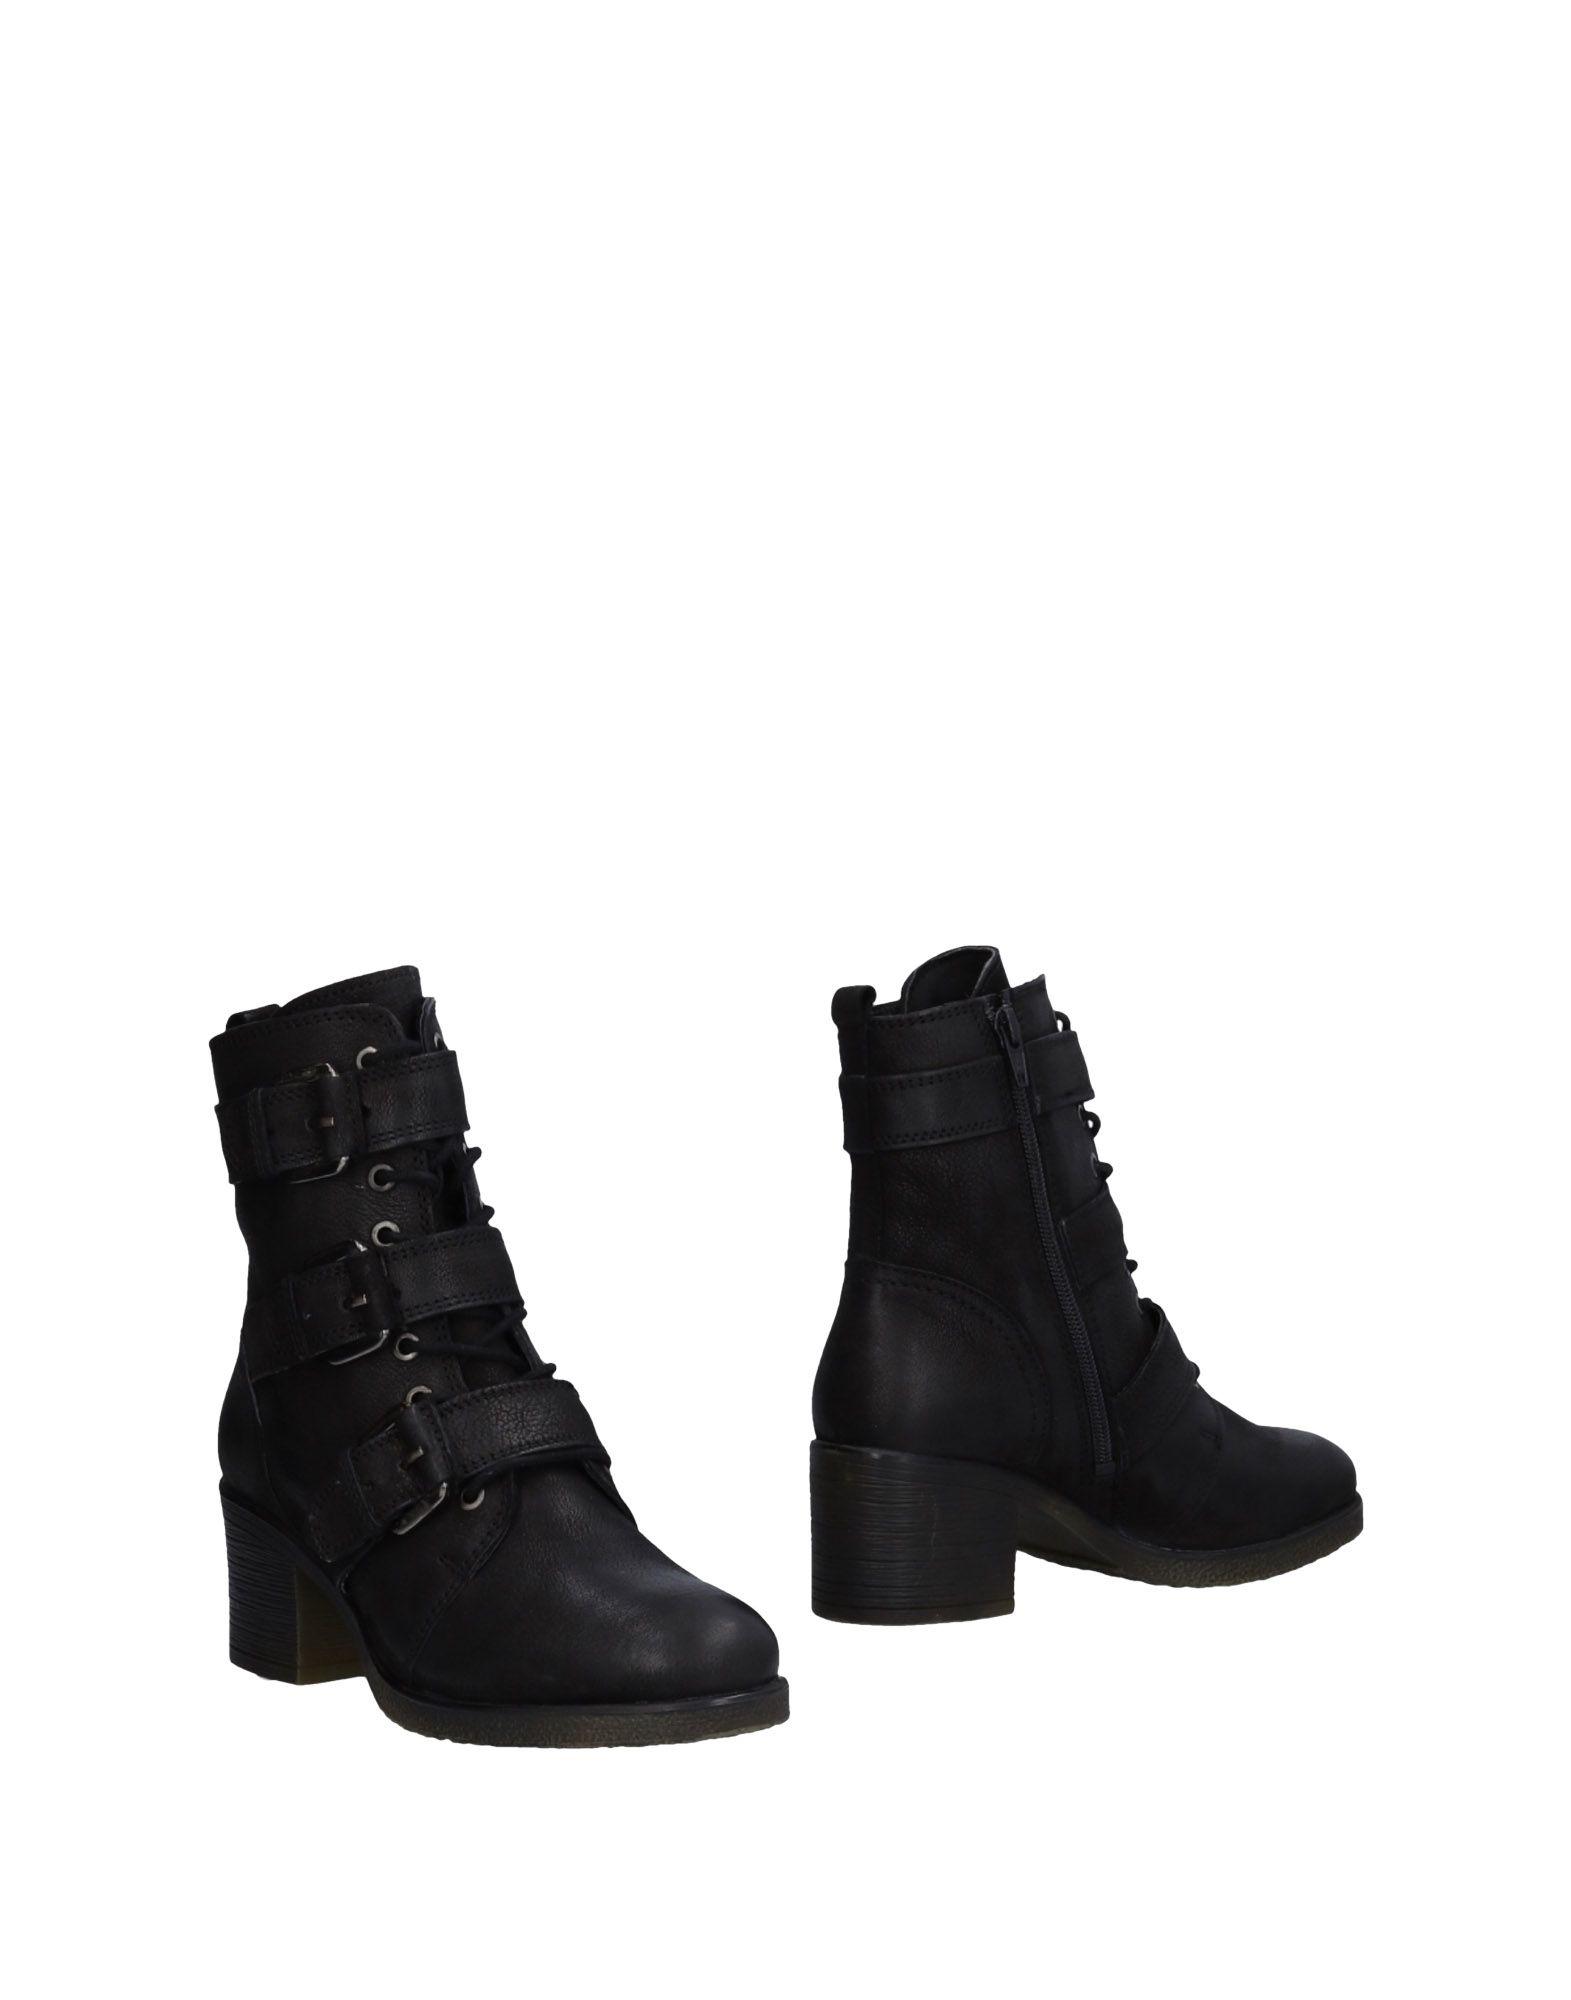 Carmela Stiefelette Damen  11472277AL Gute Qualität beliebte Schuhe